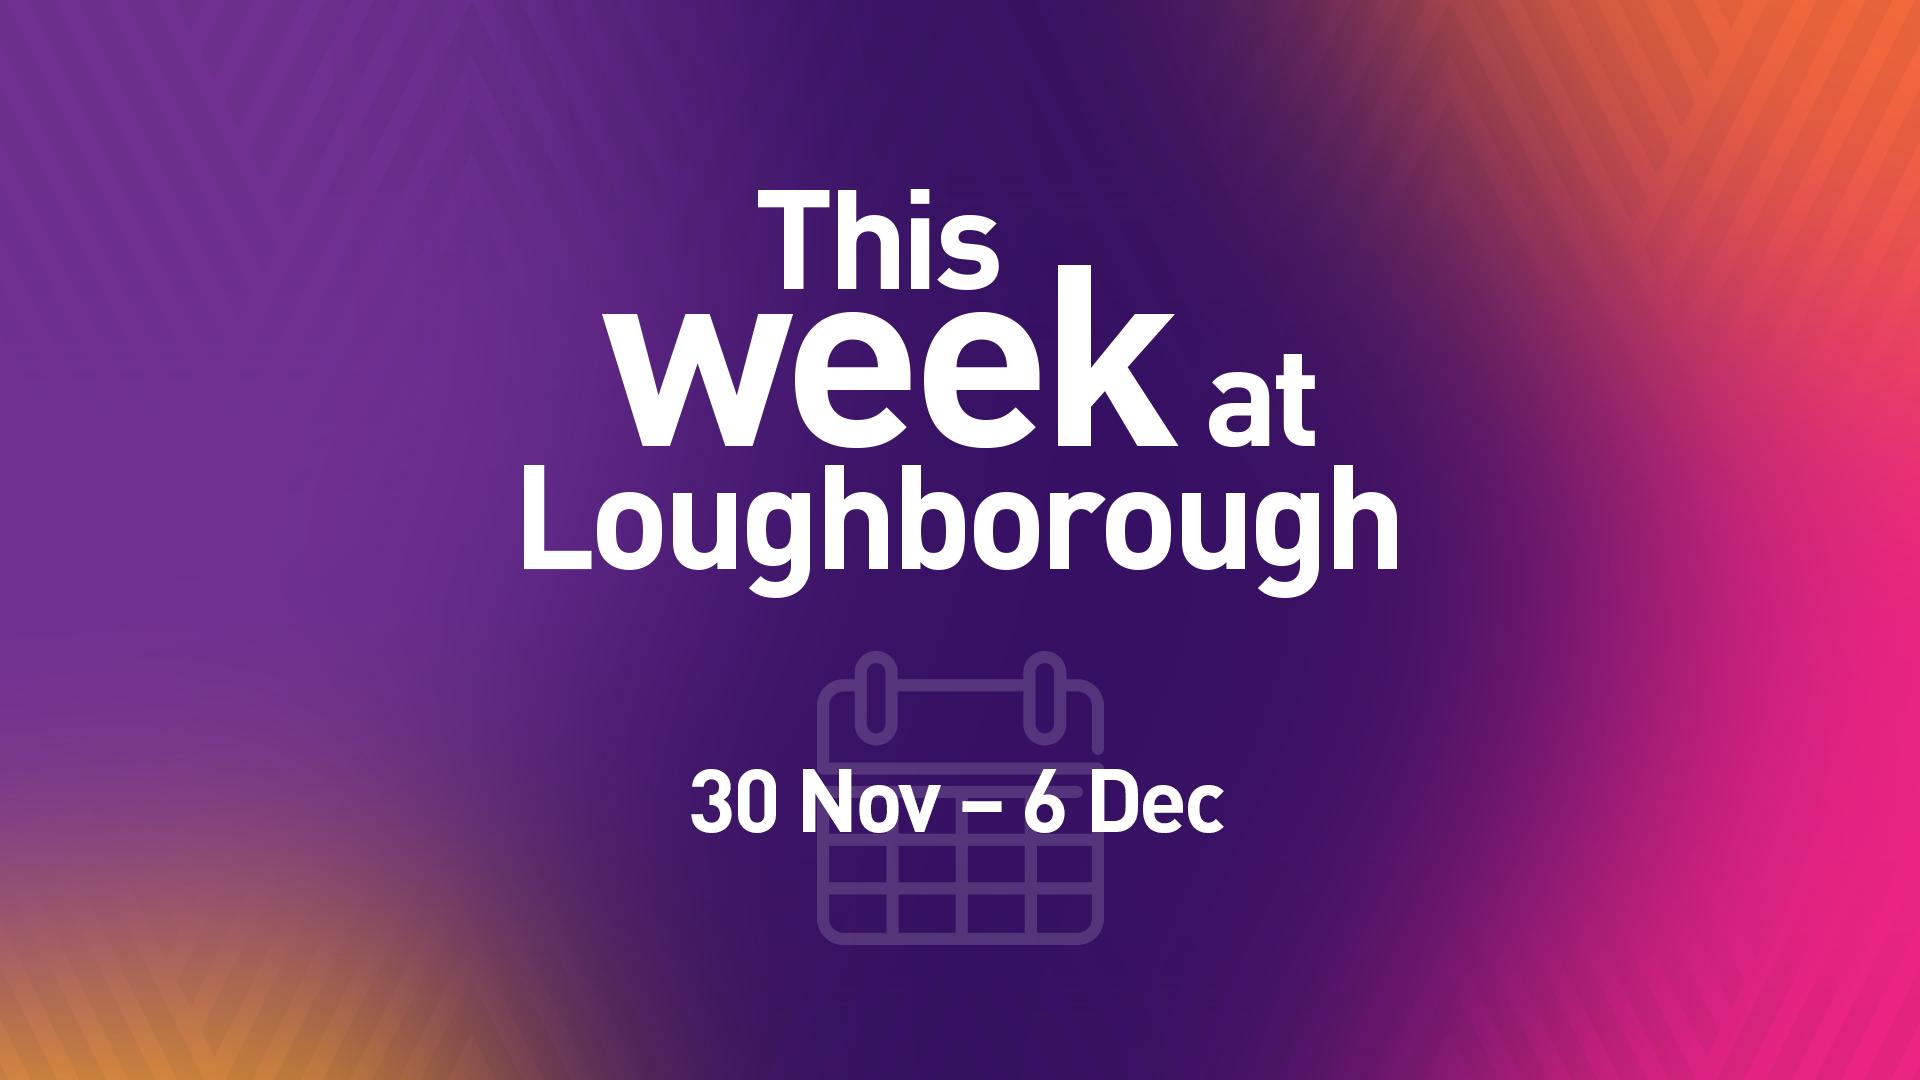 This Week at Loughborough | 30 November